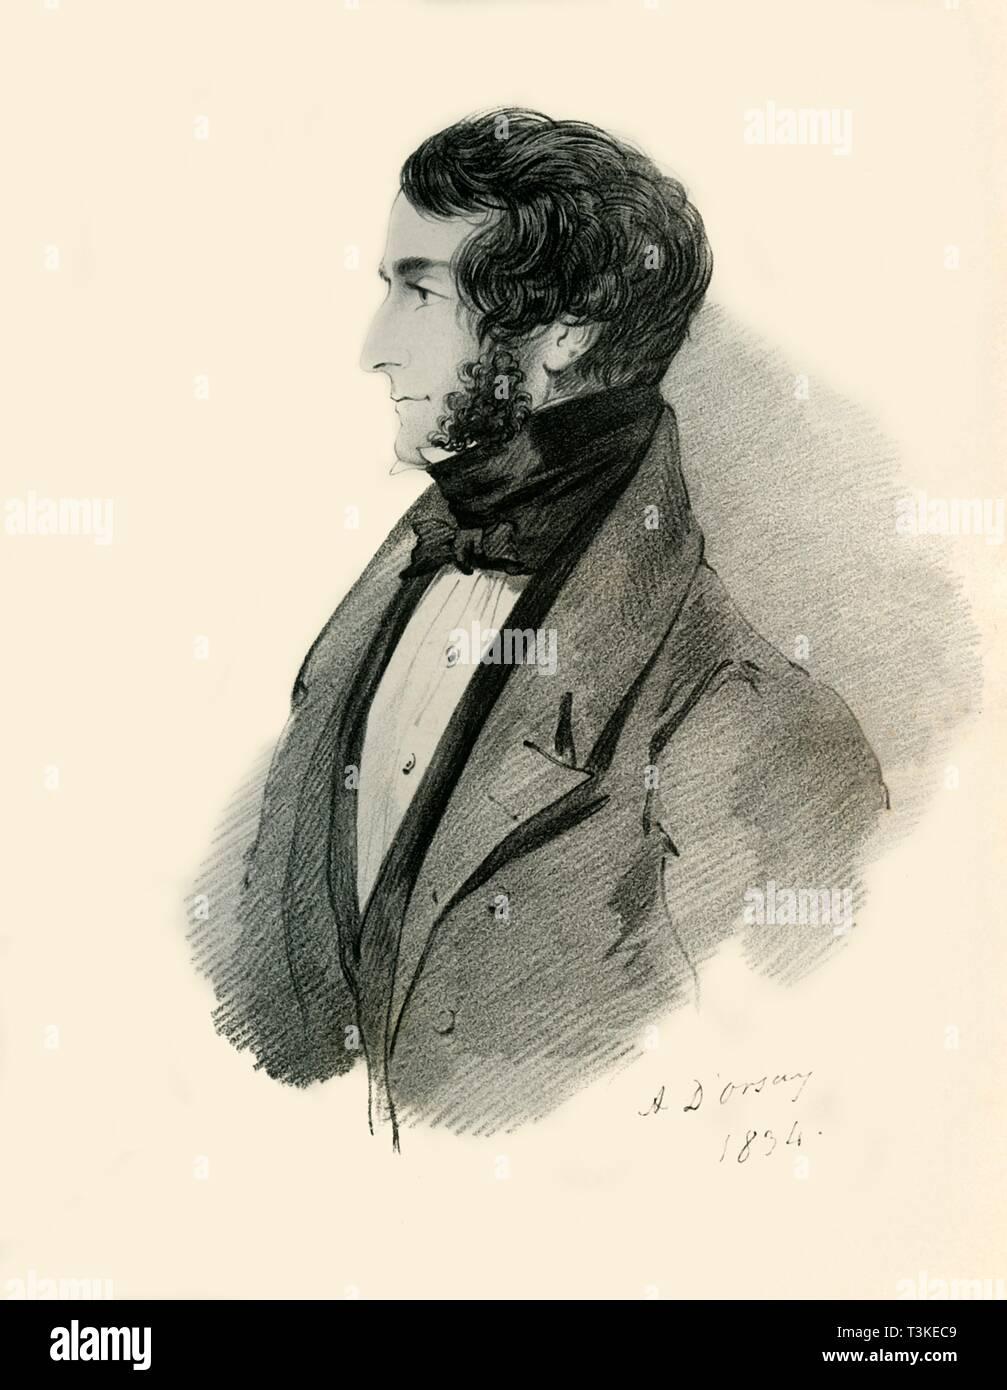 Colonel John Lyster, 1834. Creator: Richard James Lane. - Stock Image